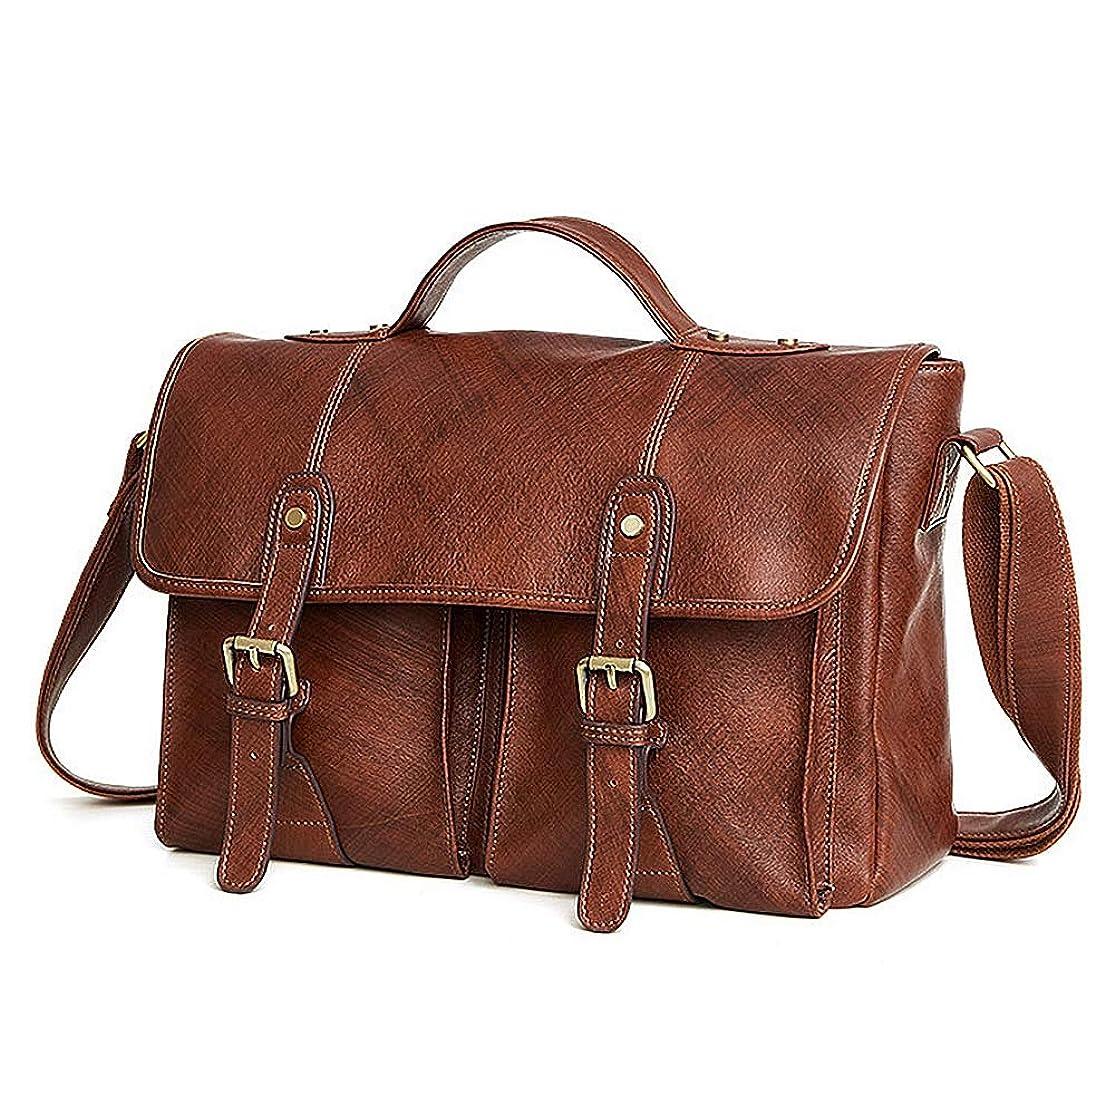 FGEFG Large Size Men's Laptop Bag Travel Briefcase with Organizer Expandable Shoulder Bag Water Resisatant Business Messenger Briefcases for Men and Women rupjrpzt8